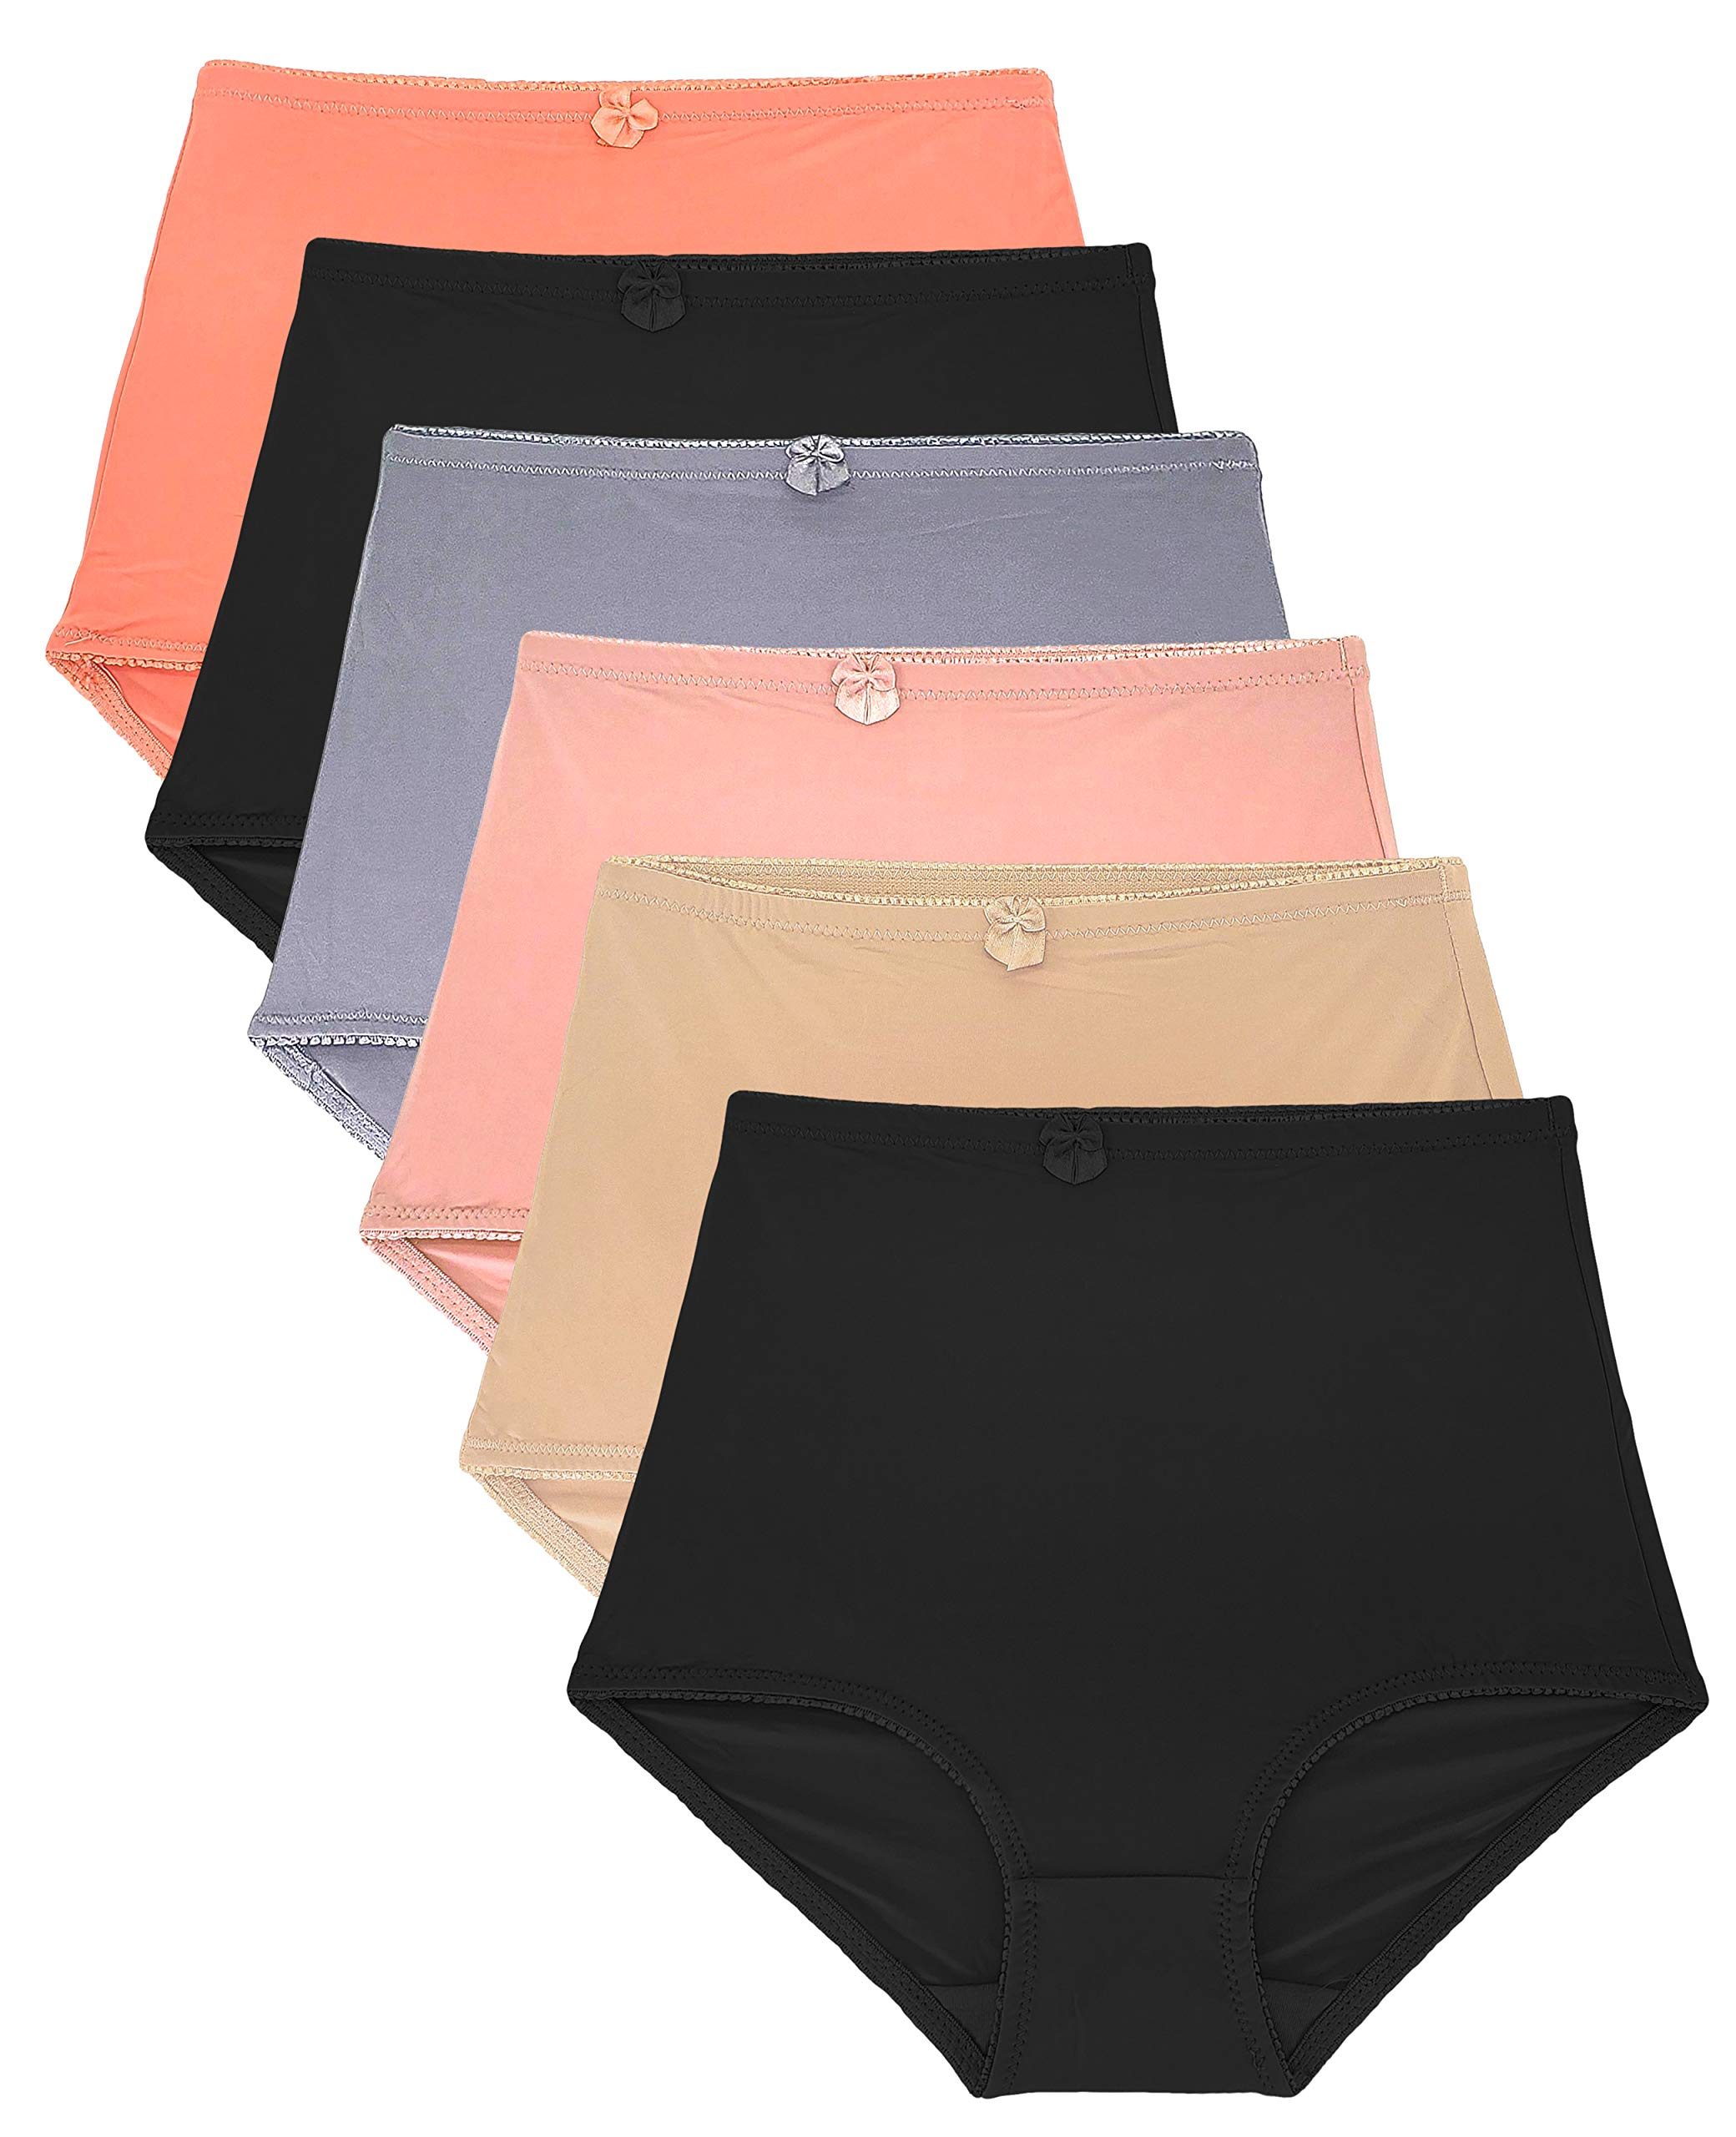 Barbra's Women's High-Waist Tummy Control Girdle Panties